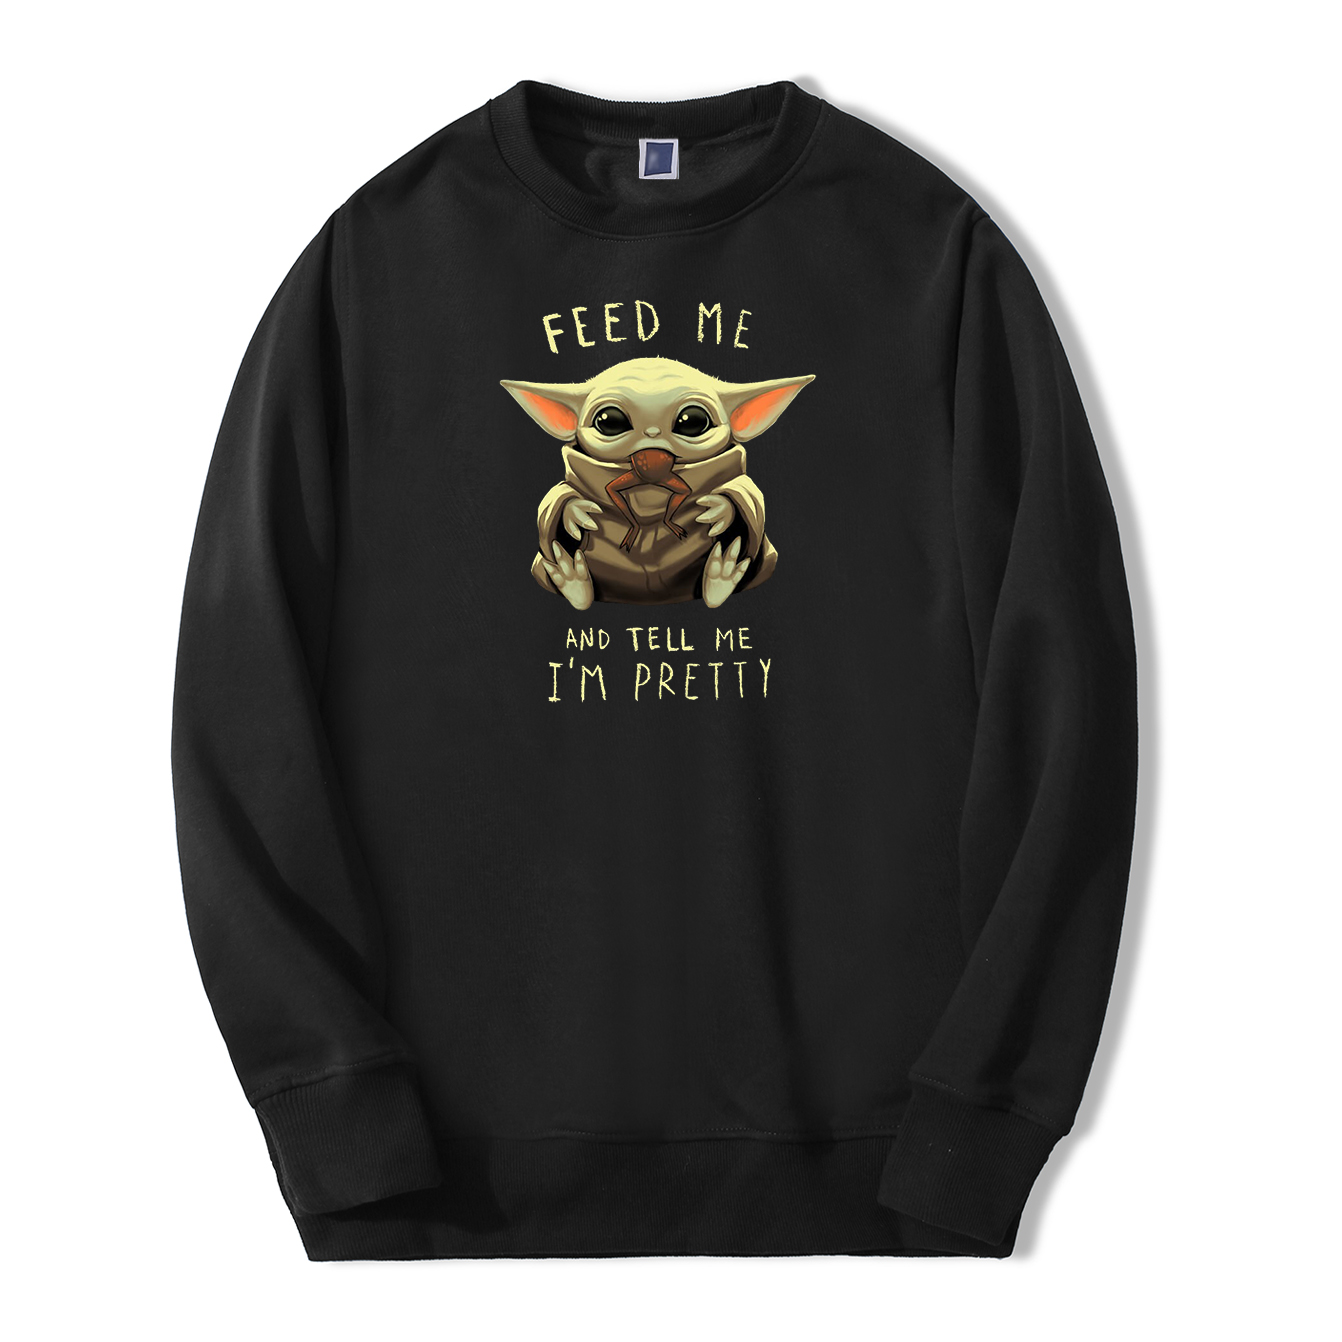 Baby Yoda Sweatshirt Hoodies Men The Mandalorian Pullover Fleece Streetwear Crewneck Feed Me And Tell Me I'm Pretty Sweatshirts